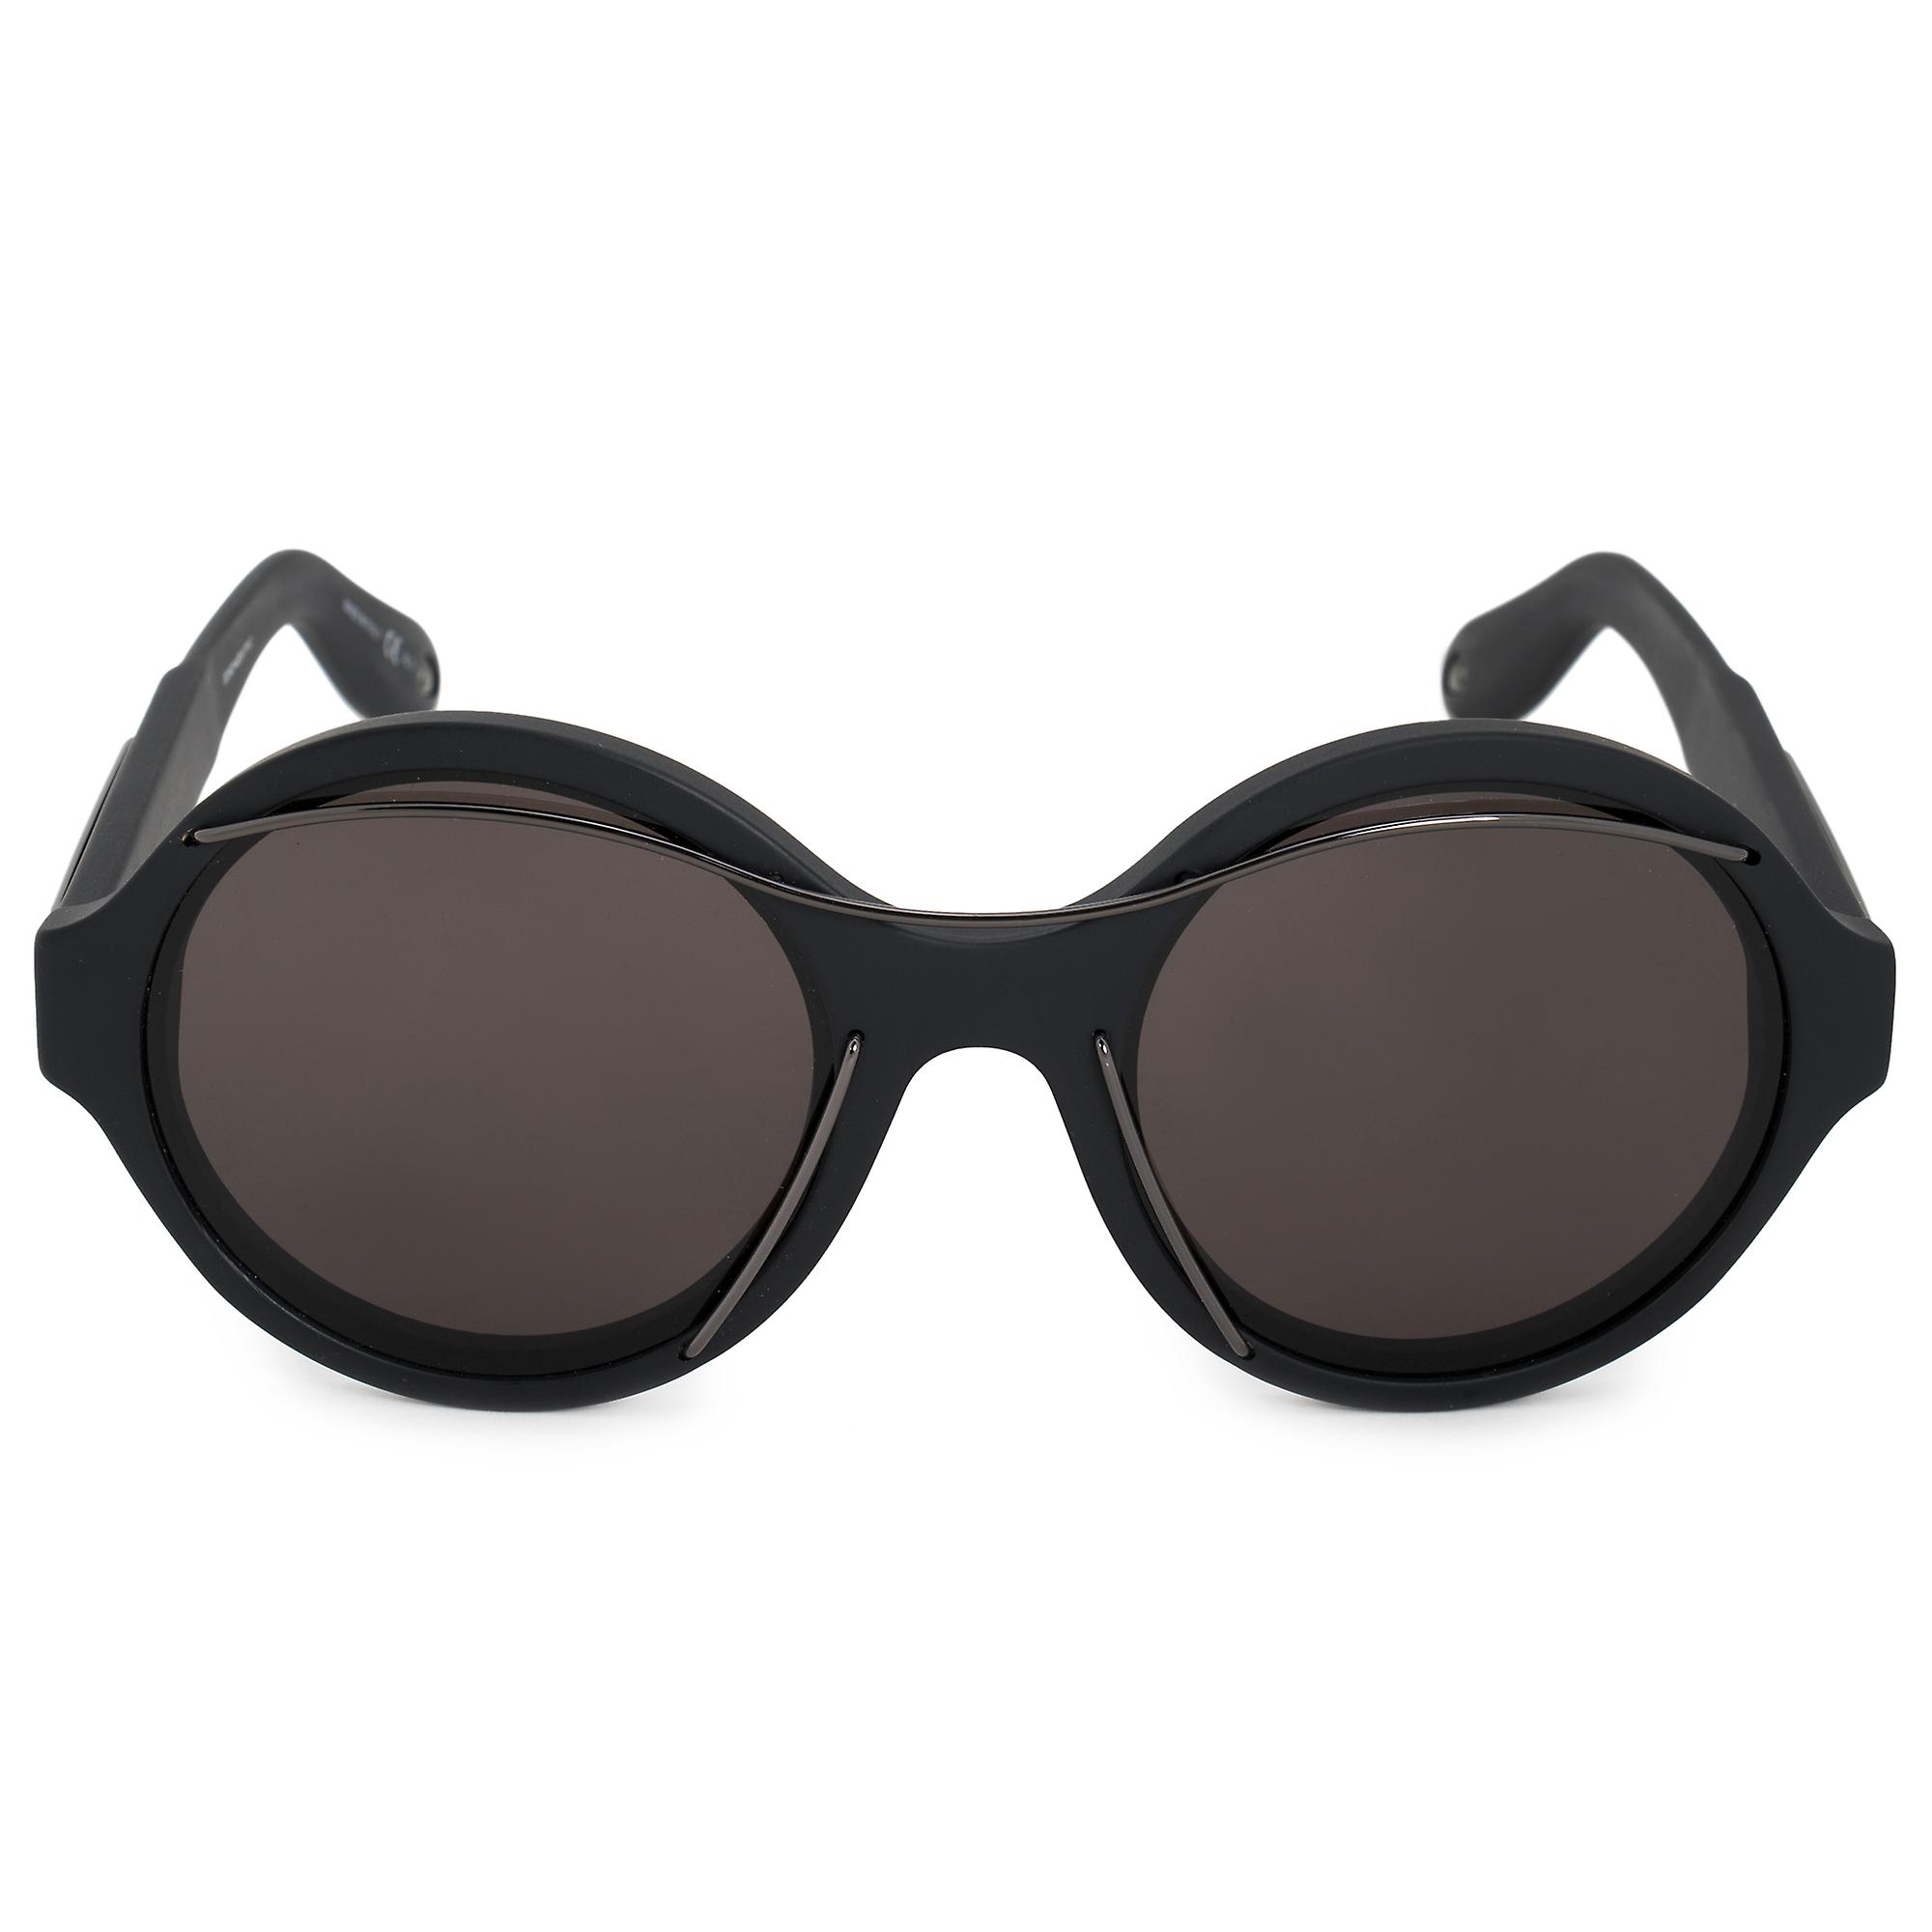 Givenchy Round Sunglasses GV7029/S 807/NR 54